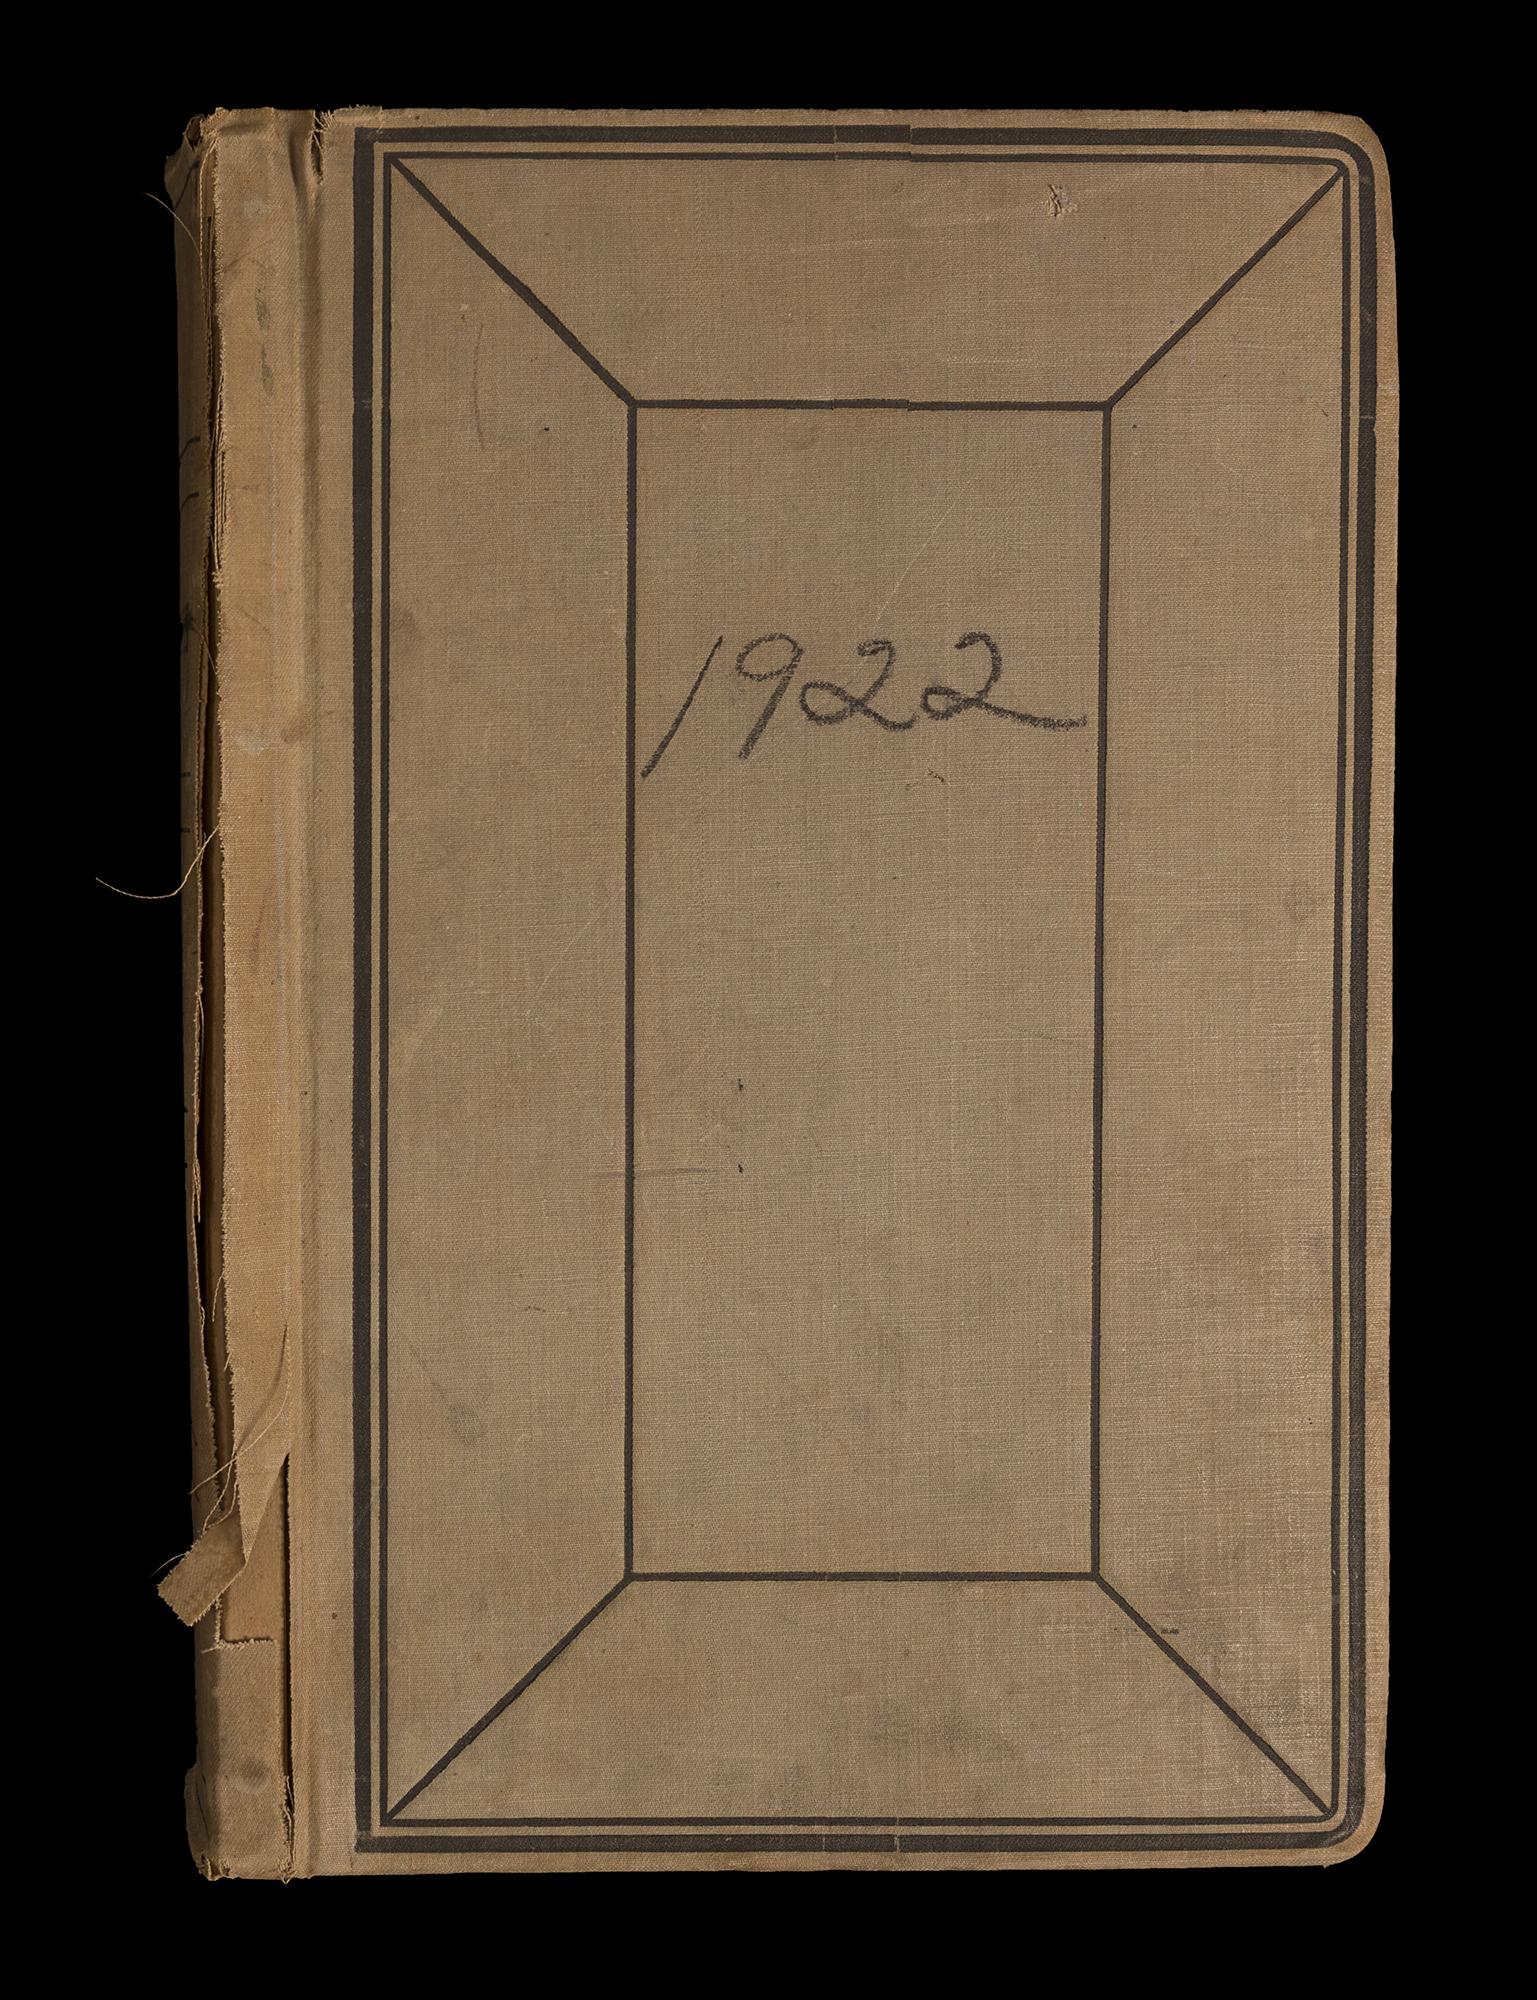 HBScrapbook_Cover_B0755_1922.jpg